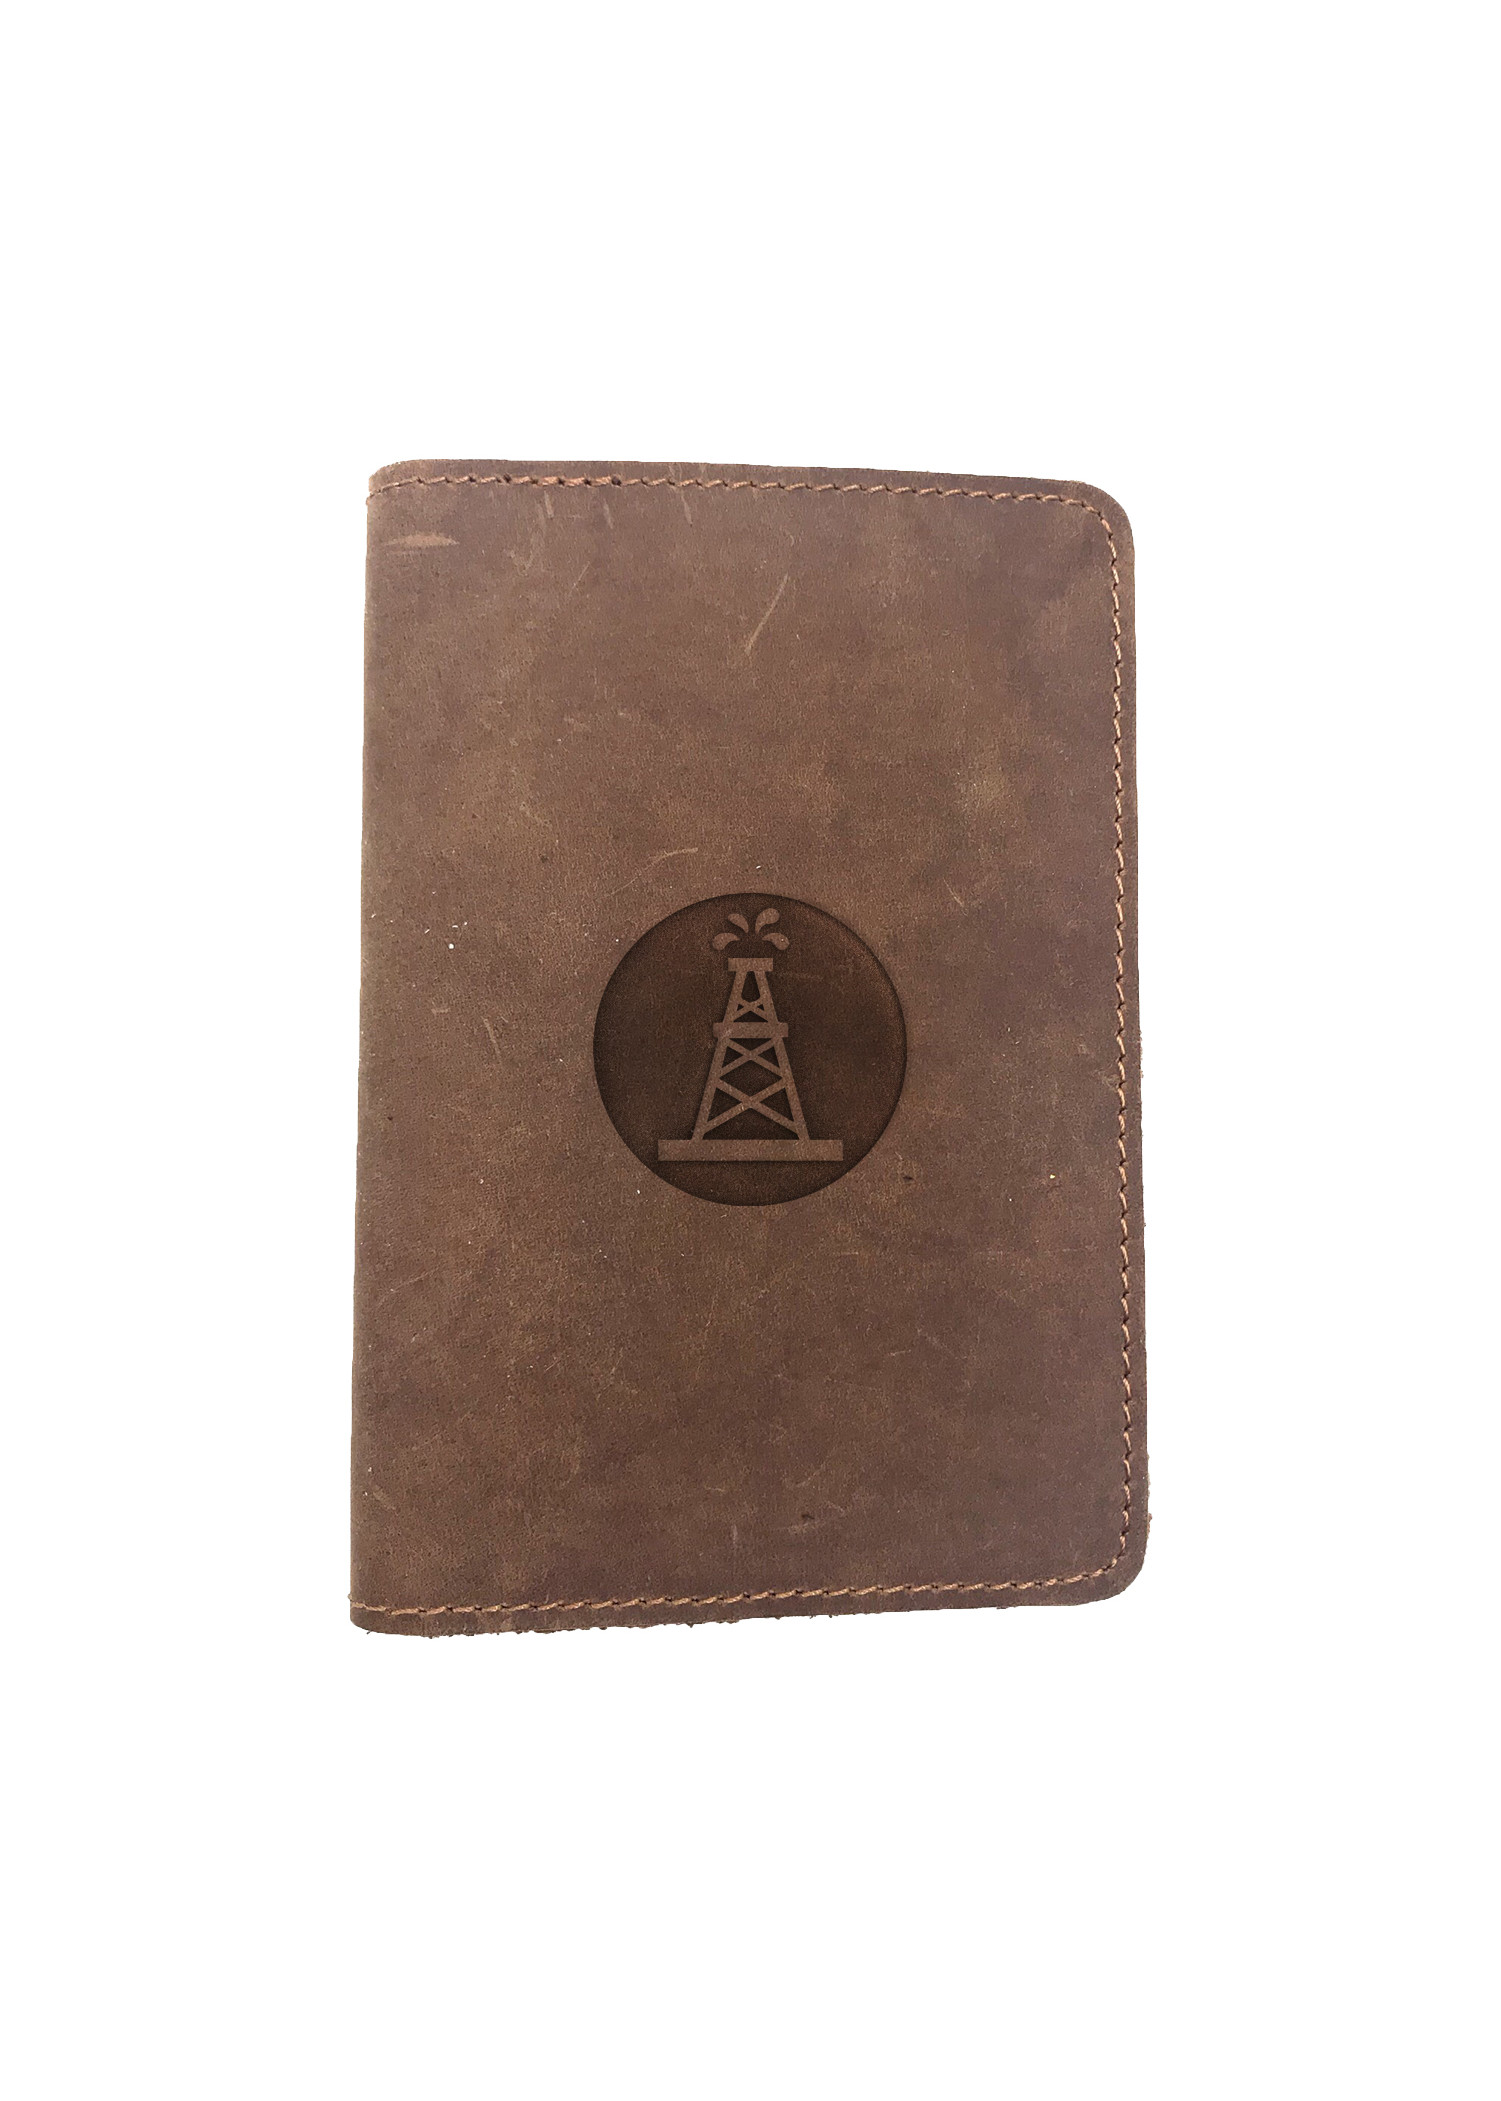 Passport Cover Bao Da Hộ Chiếu Da Sáp Khắc Hình Hình OILFIELD ROUGHNECK (BROWN)